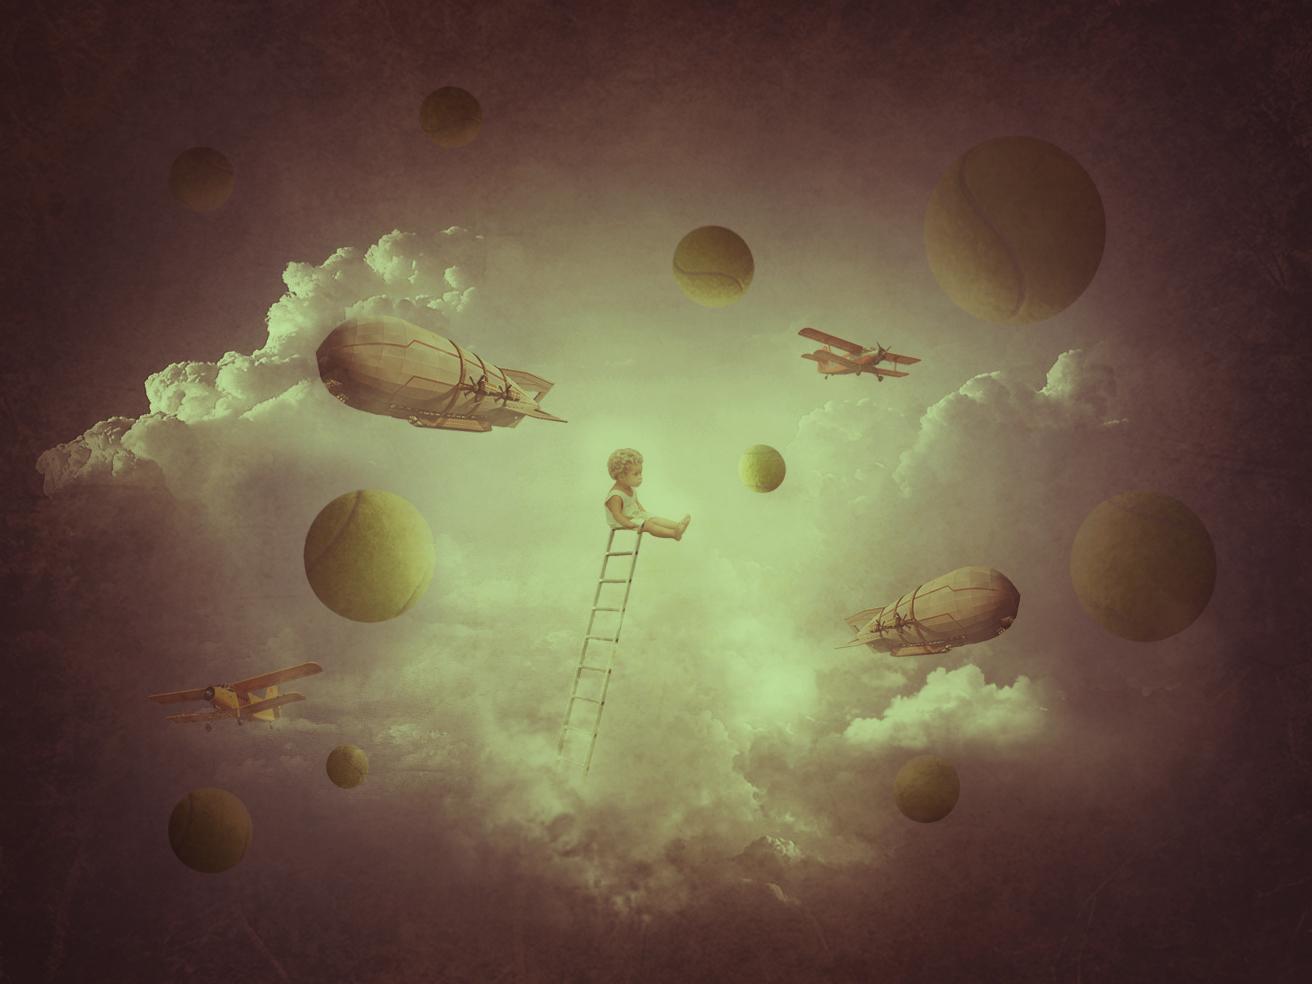 "Collage "" Children's dreams"" collage art illustration photoshop design"